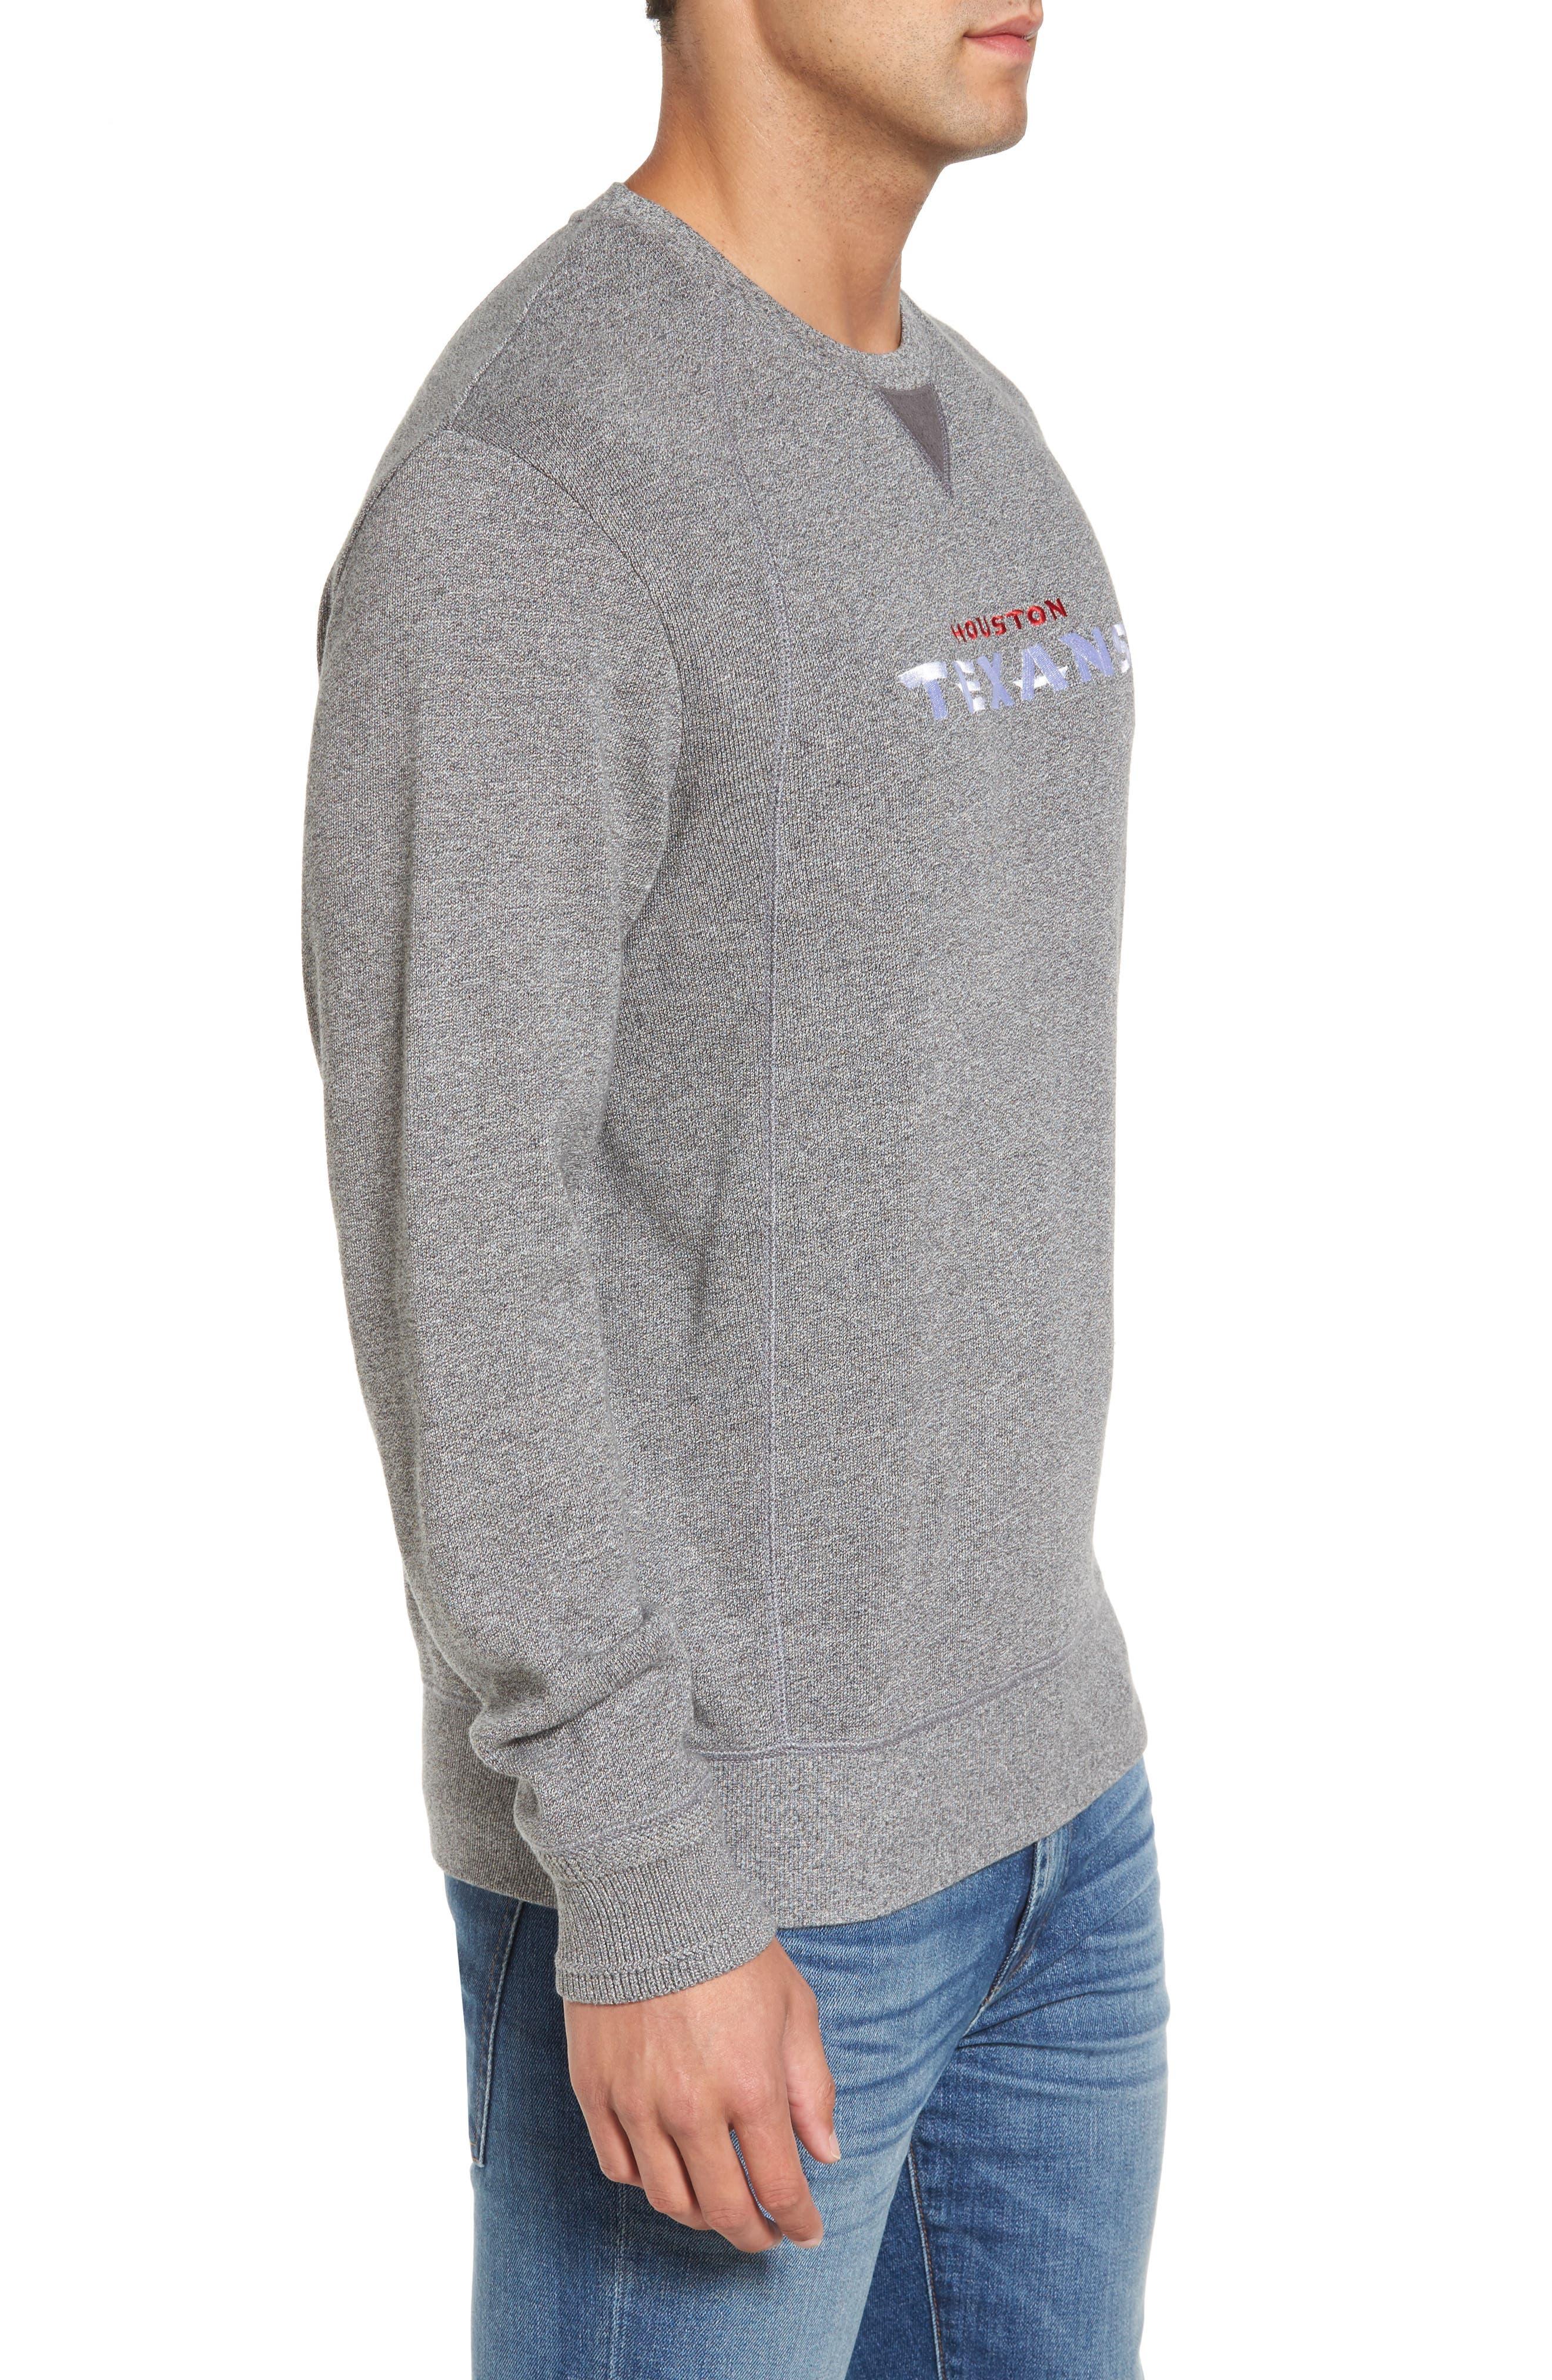 NFL Stitch of Liberty Embroidered Crewneck Sweatshirt,                             Alternate thumbnail 90, color,